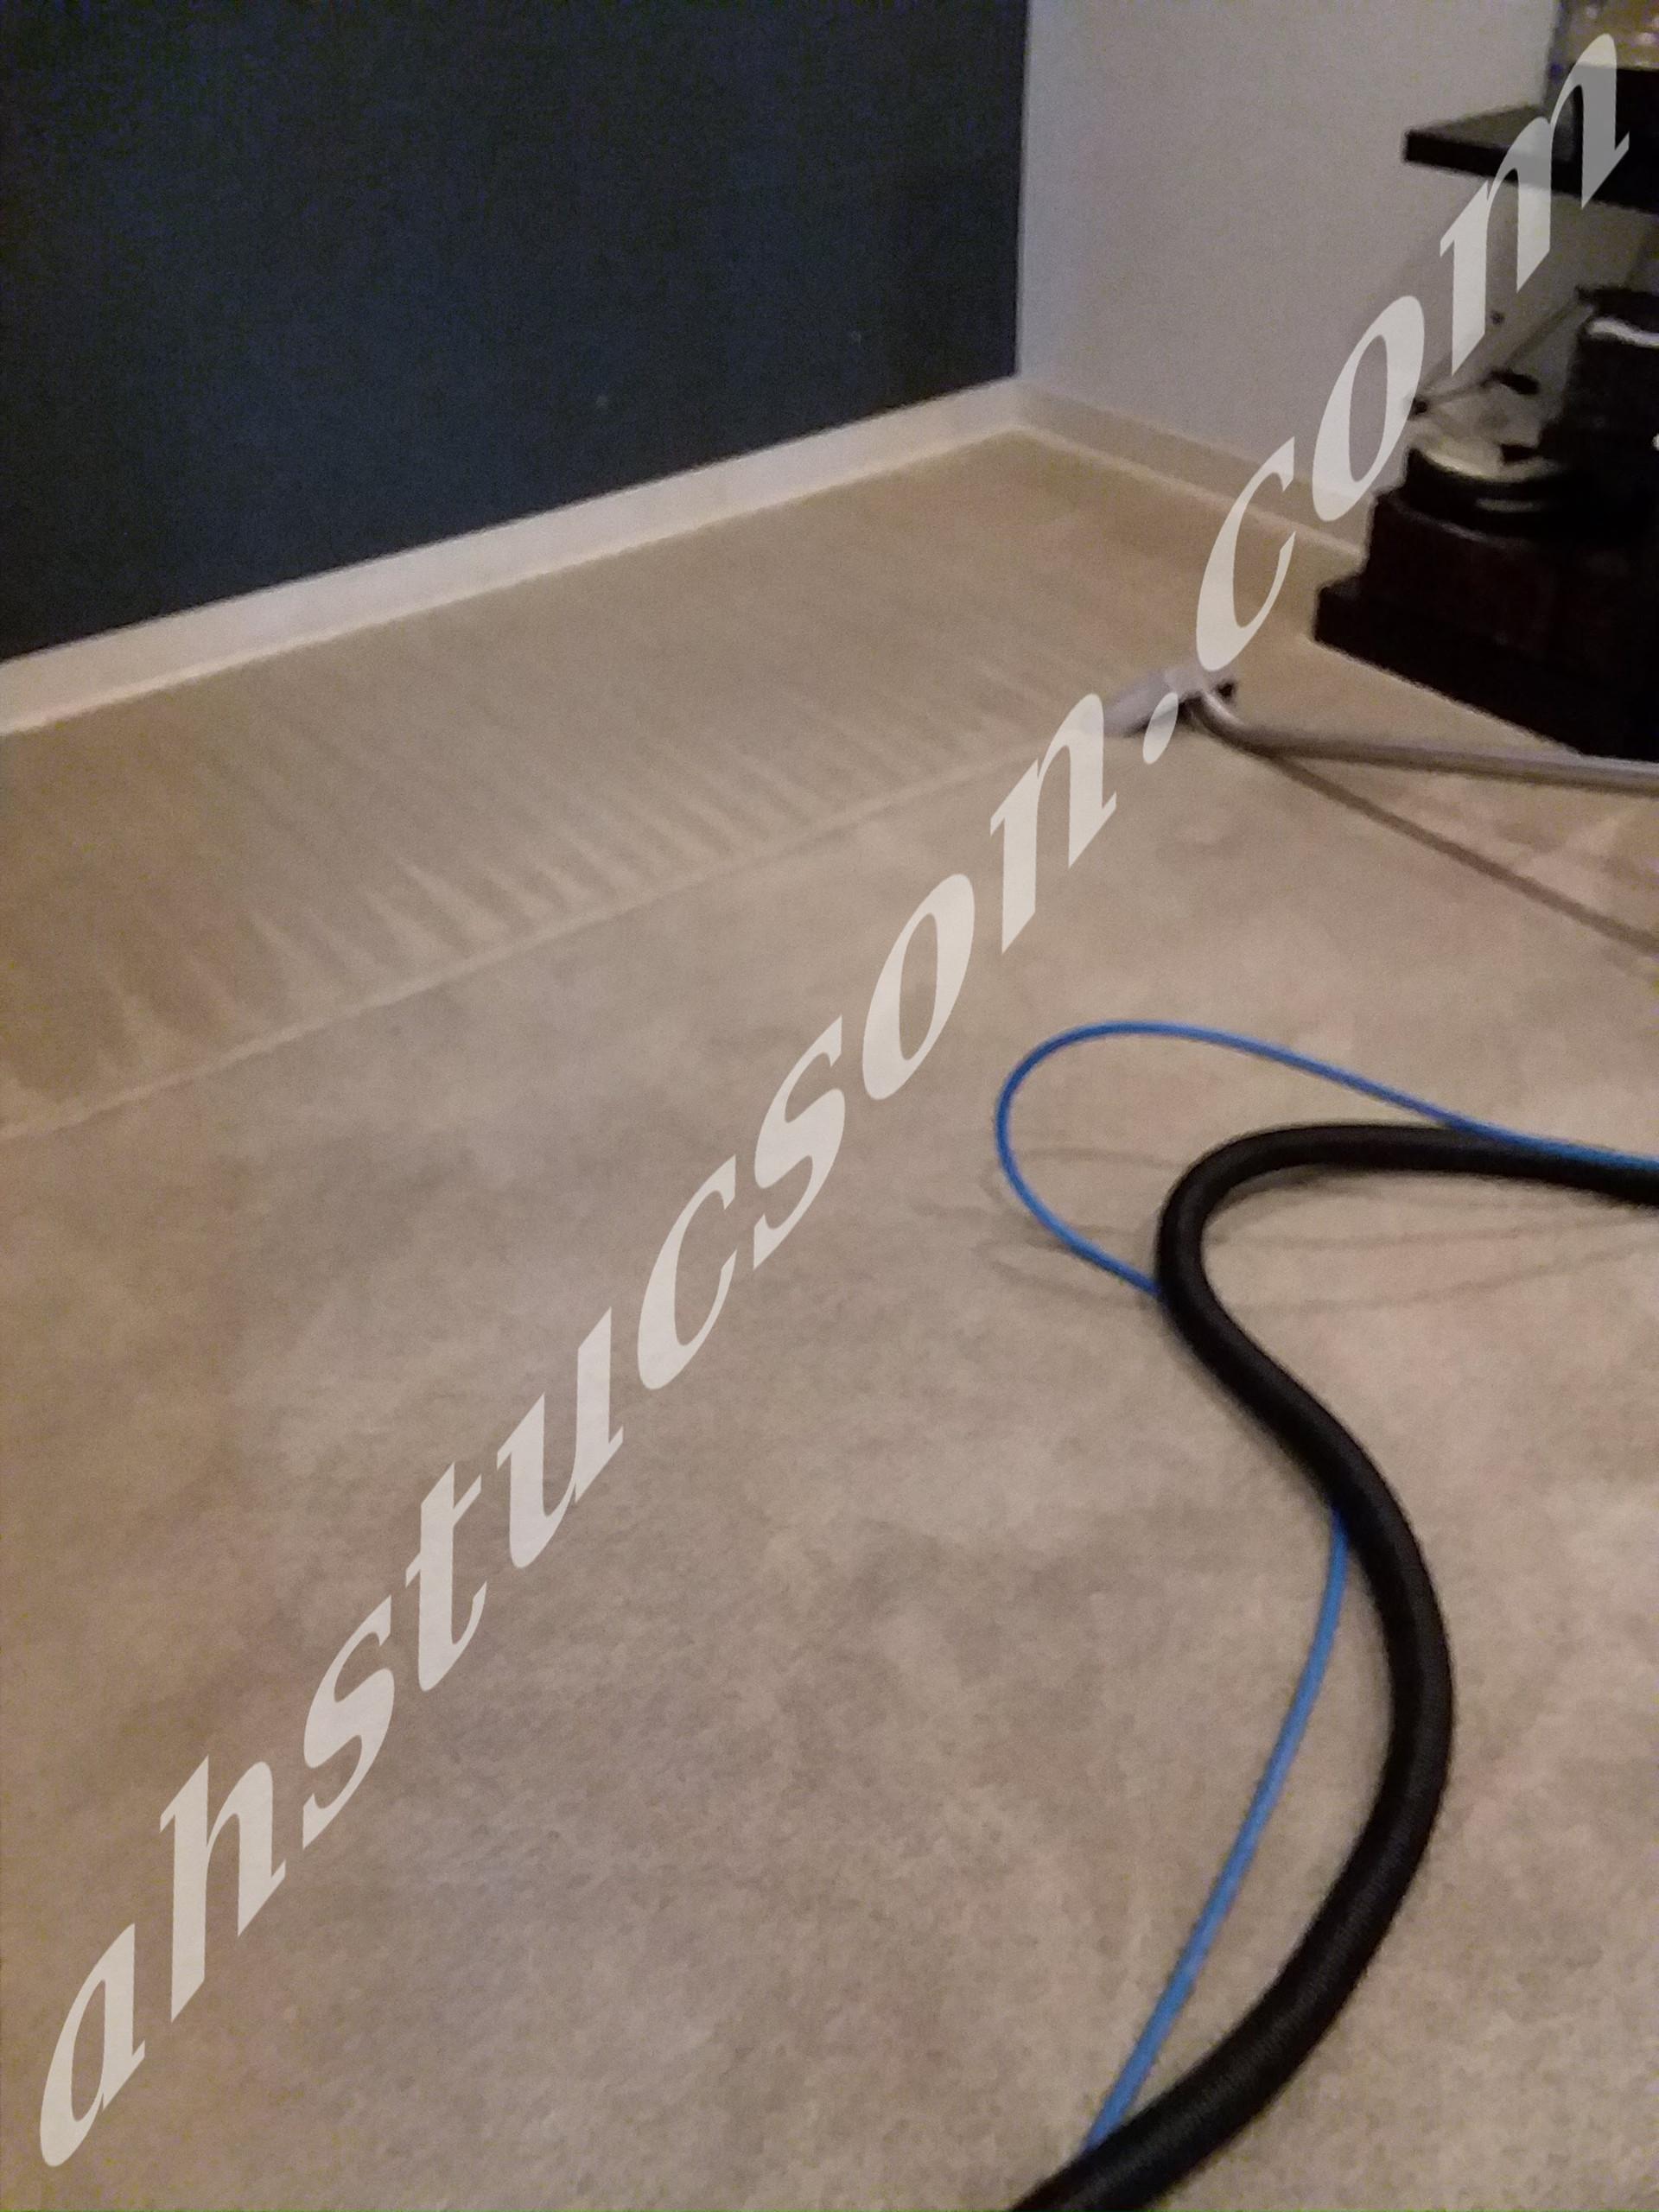 carpet-cleaning-20180324_101219.jpg